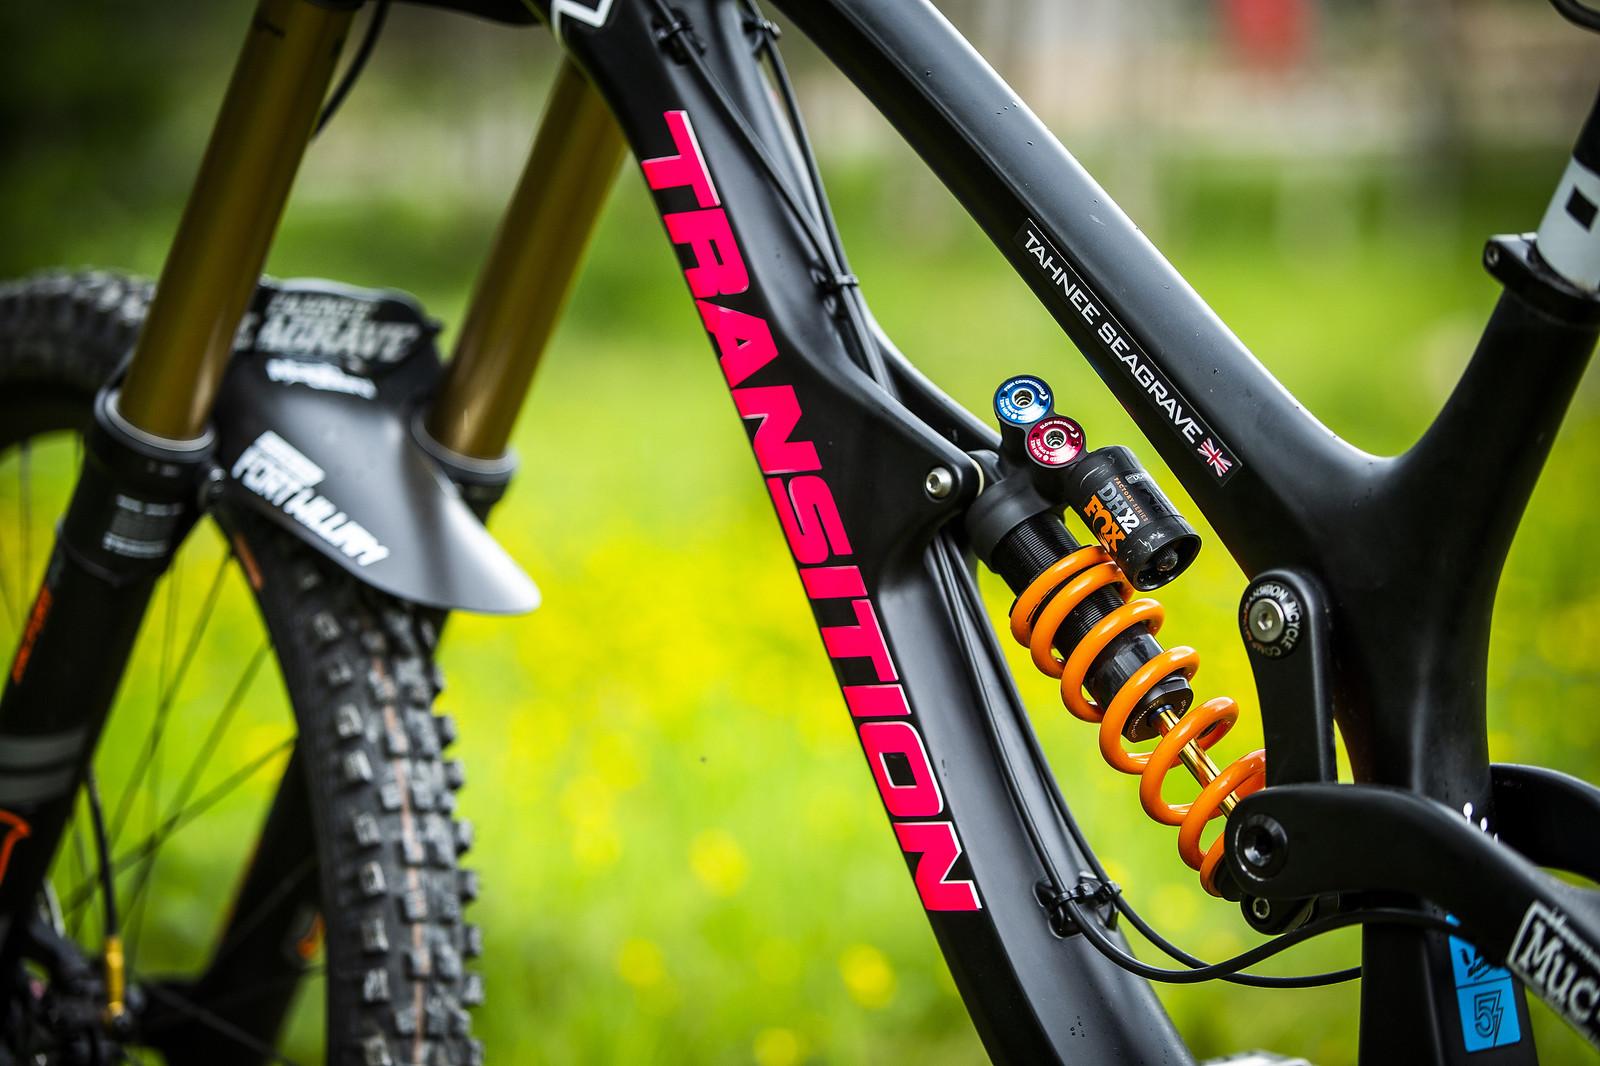 Clean lines - WINNING BIKE - Tahnee Seagrave's Transition TR11 - Mountain Biking Pictures - Vital MTB